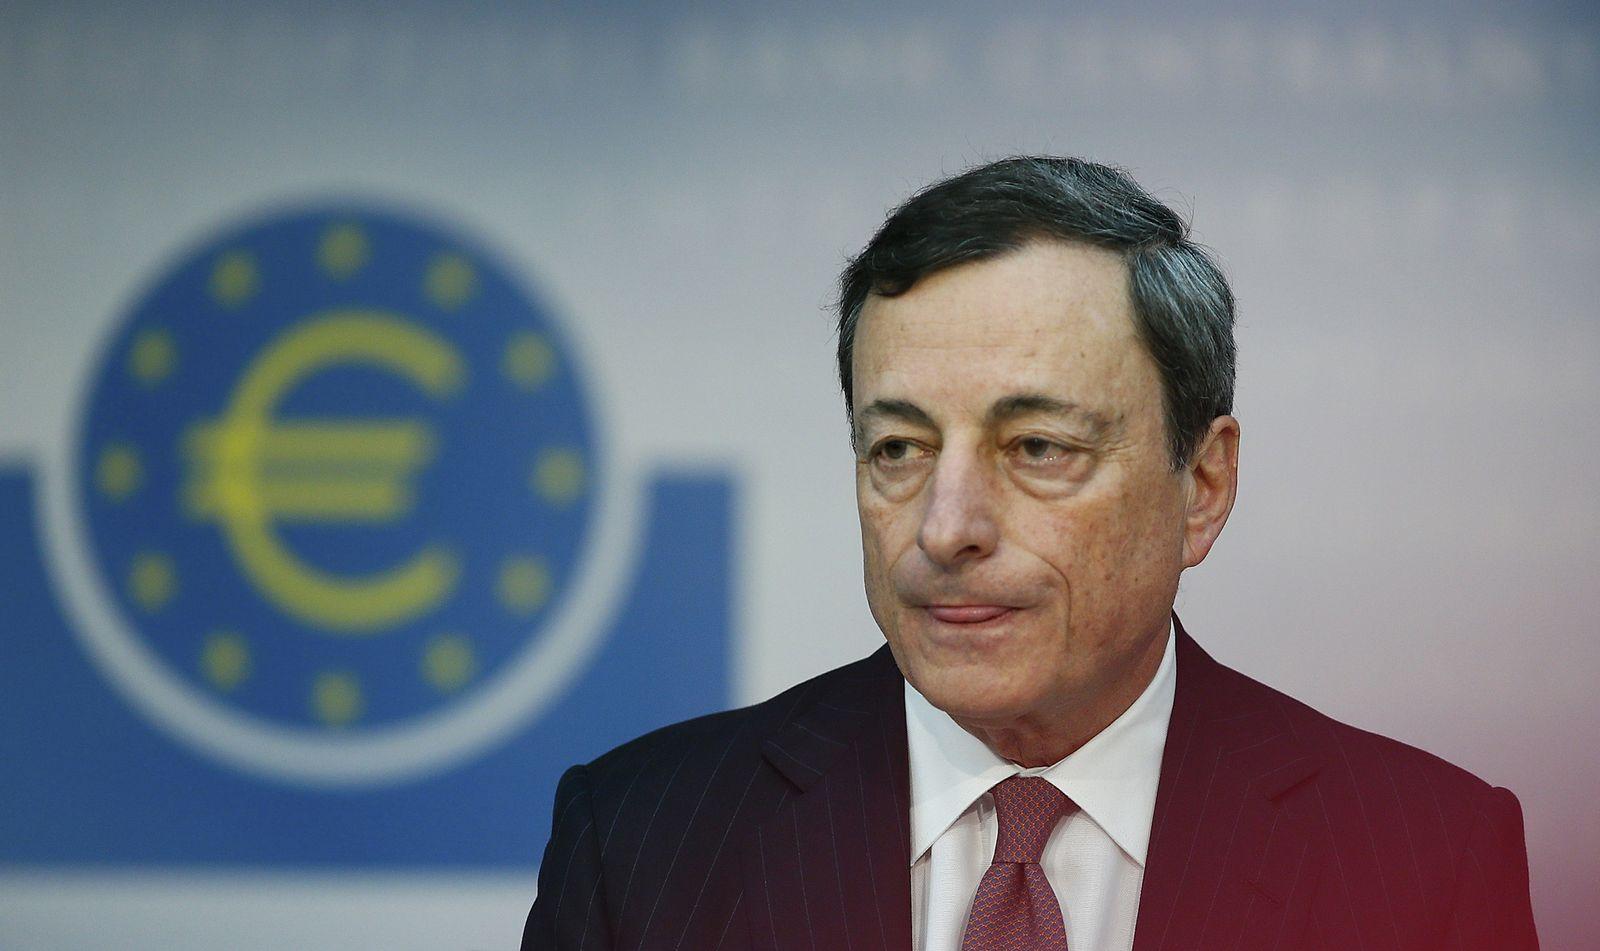 EZB / Mario Draghi